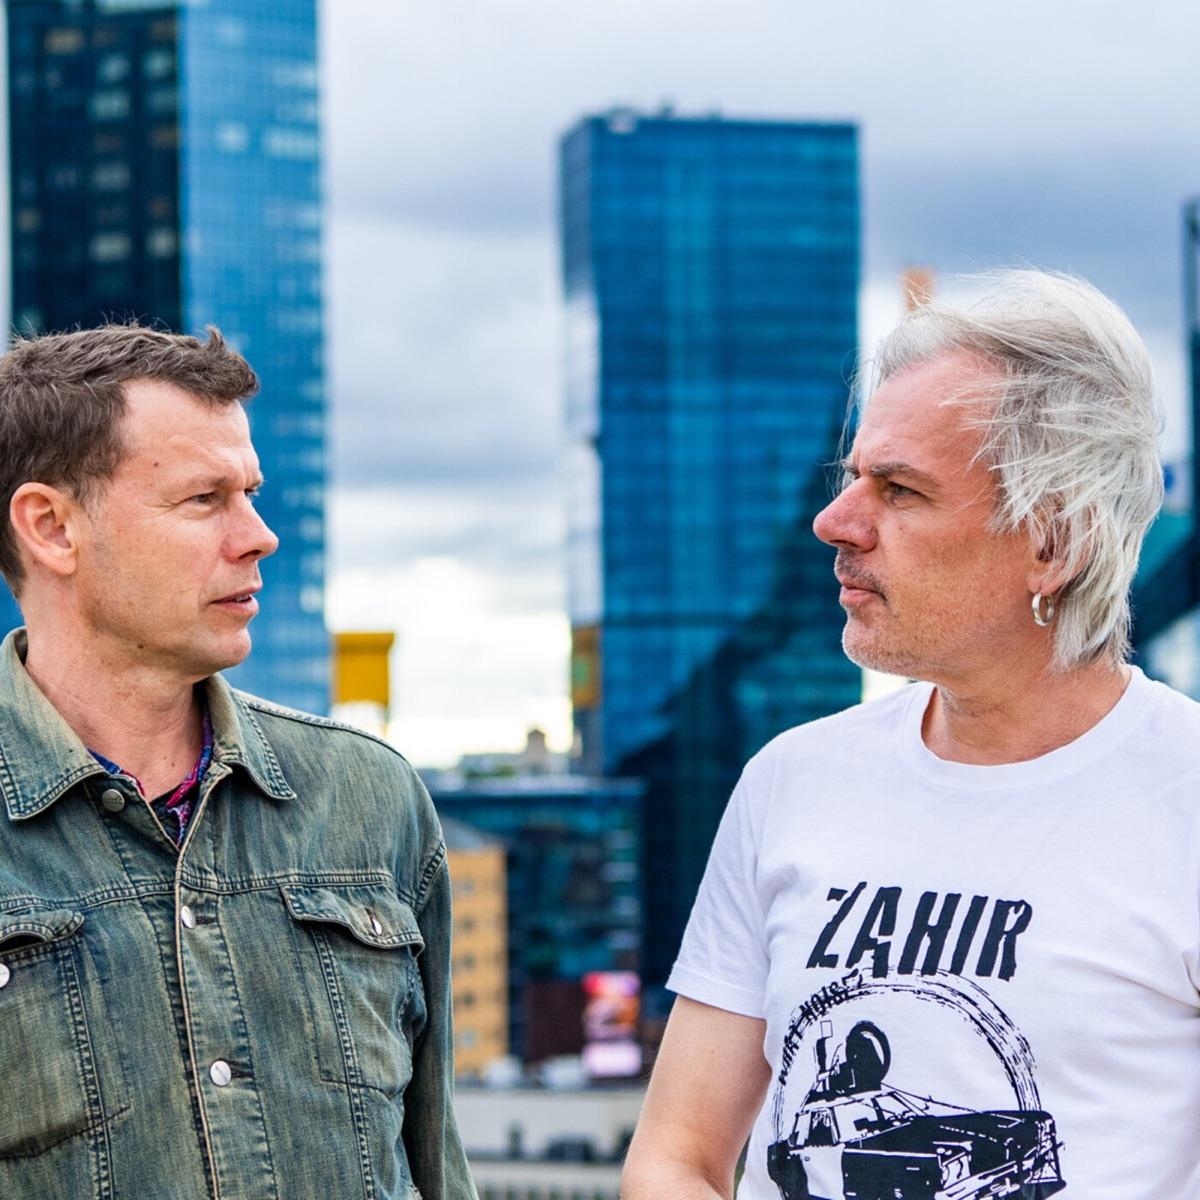 Nädal muusikas 09.12.2020. Aivar Meos & Lennart Beat